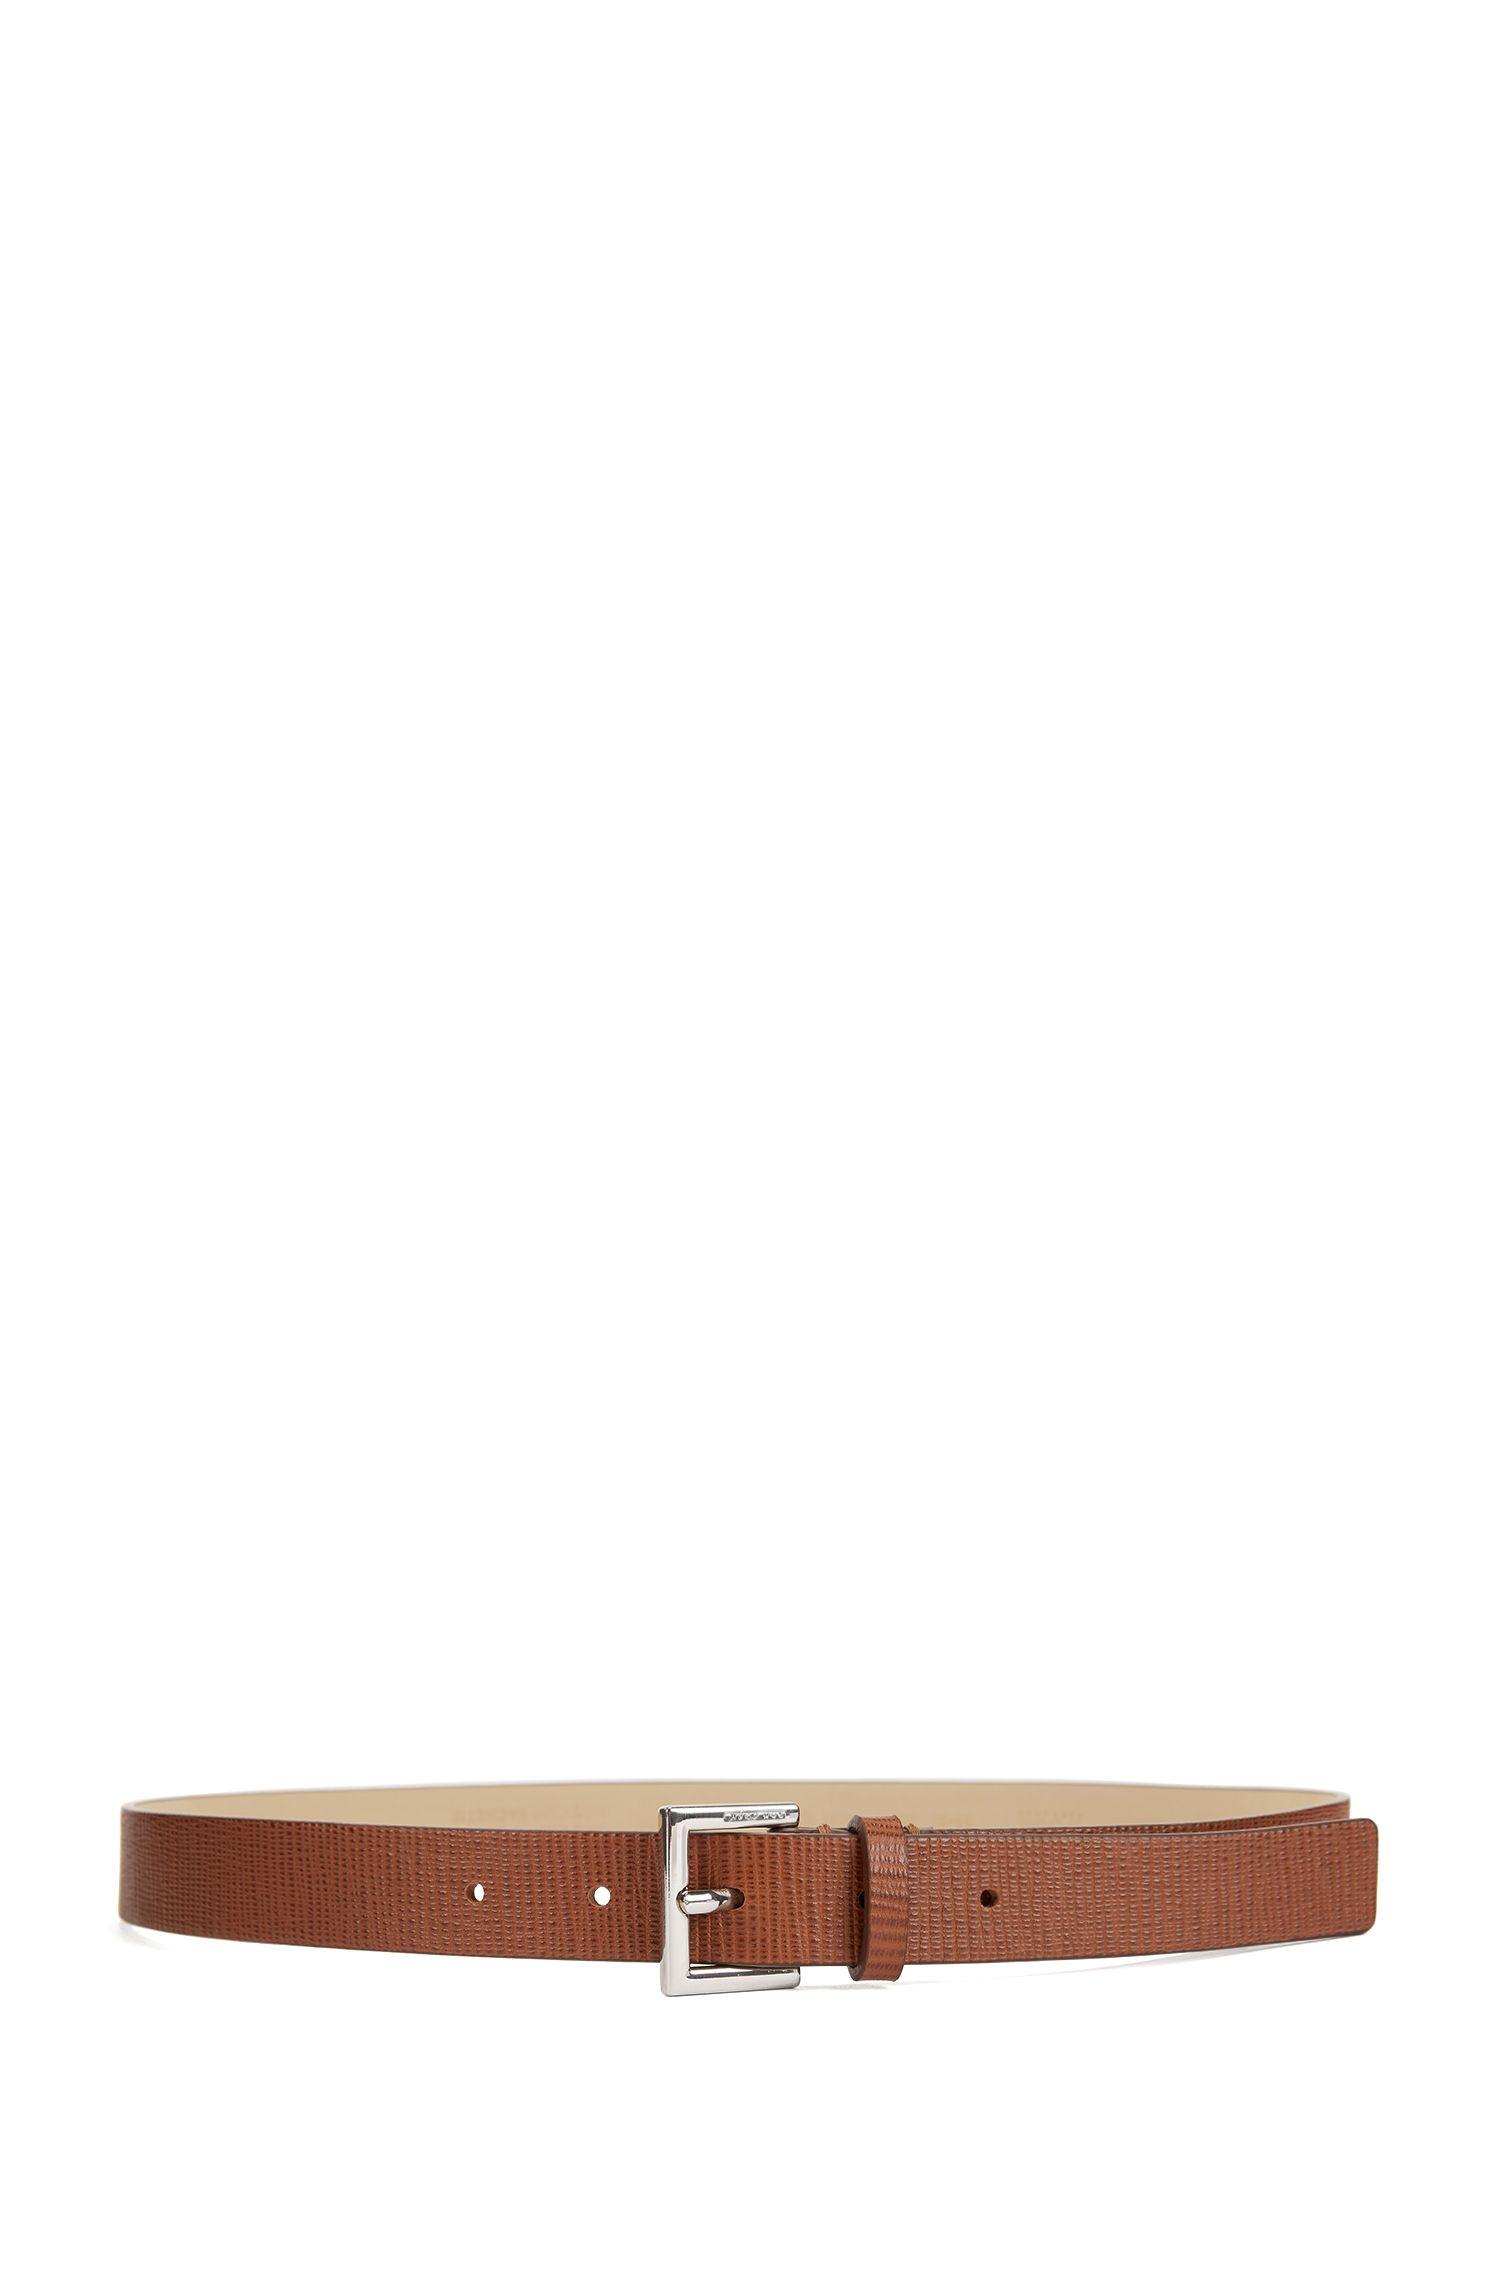 Schmaler Gürtel aus geprägtem italienischem Leder